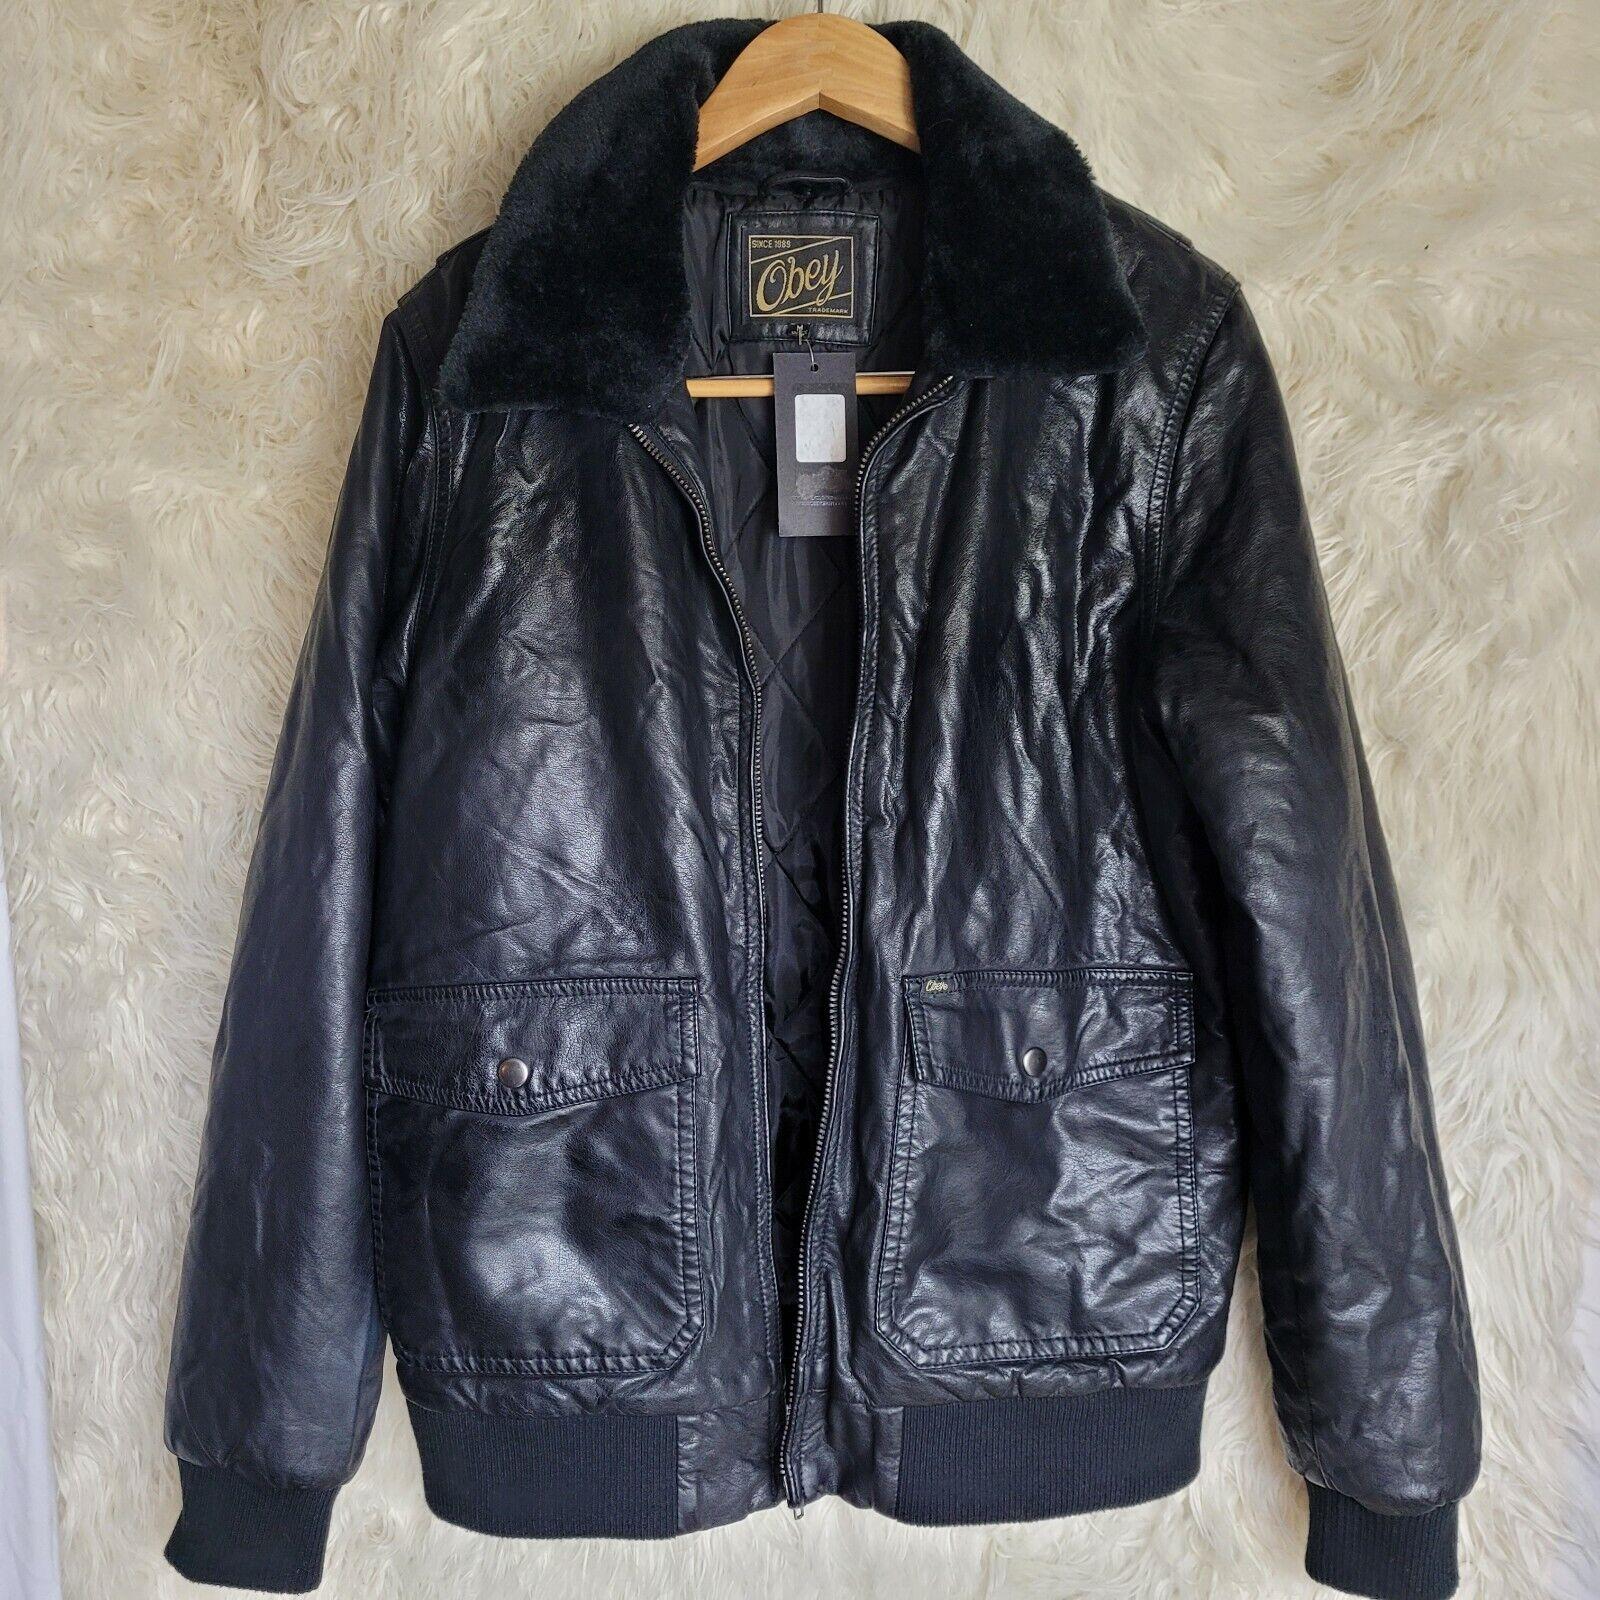 OBEY Downtown Bomber Black Faux Leather Shell Sherpa Fleece Collar Men's  Jacket Regular L for sale online | eBay